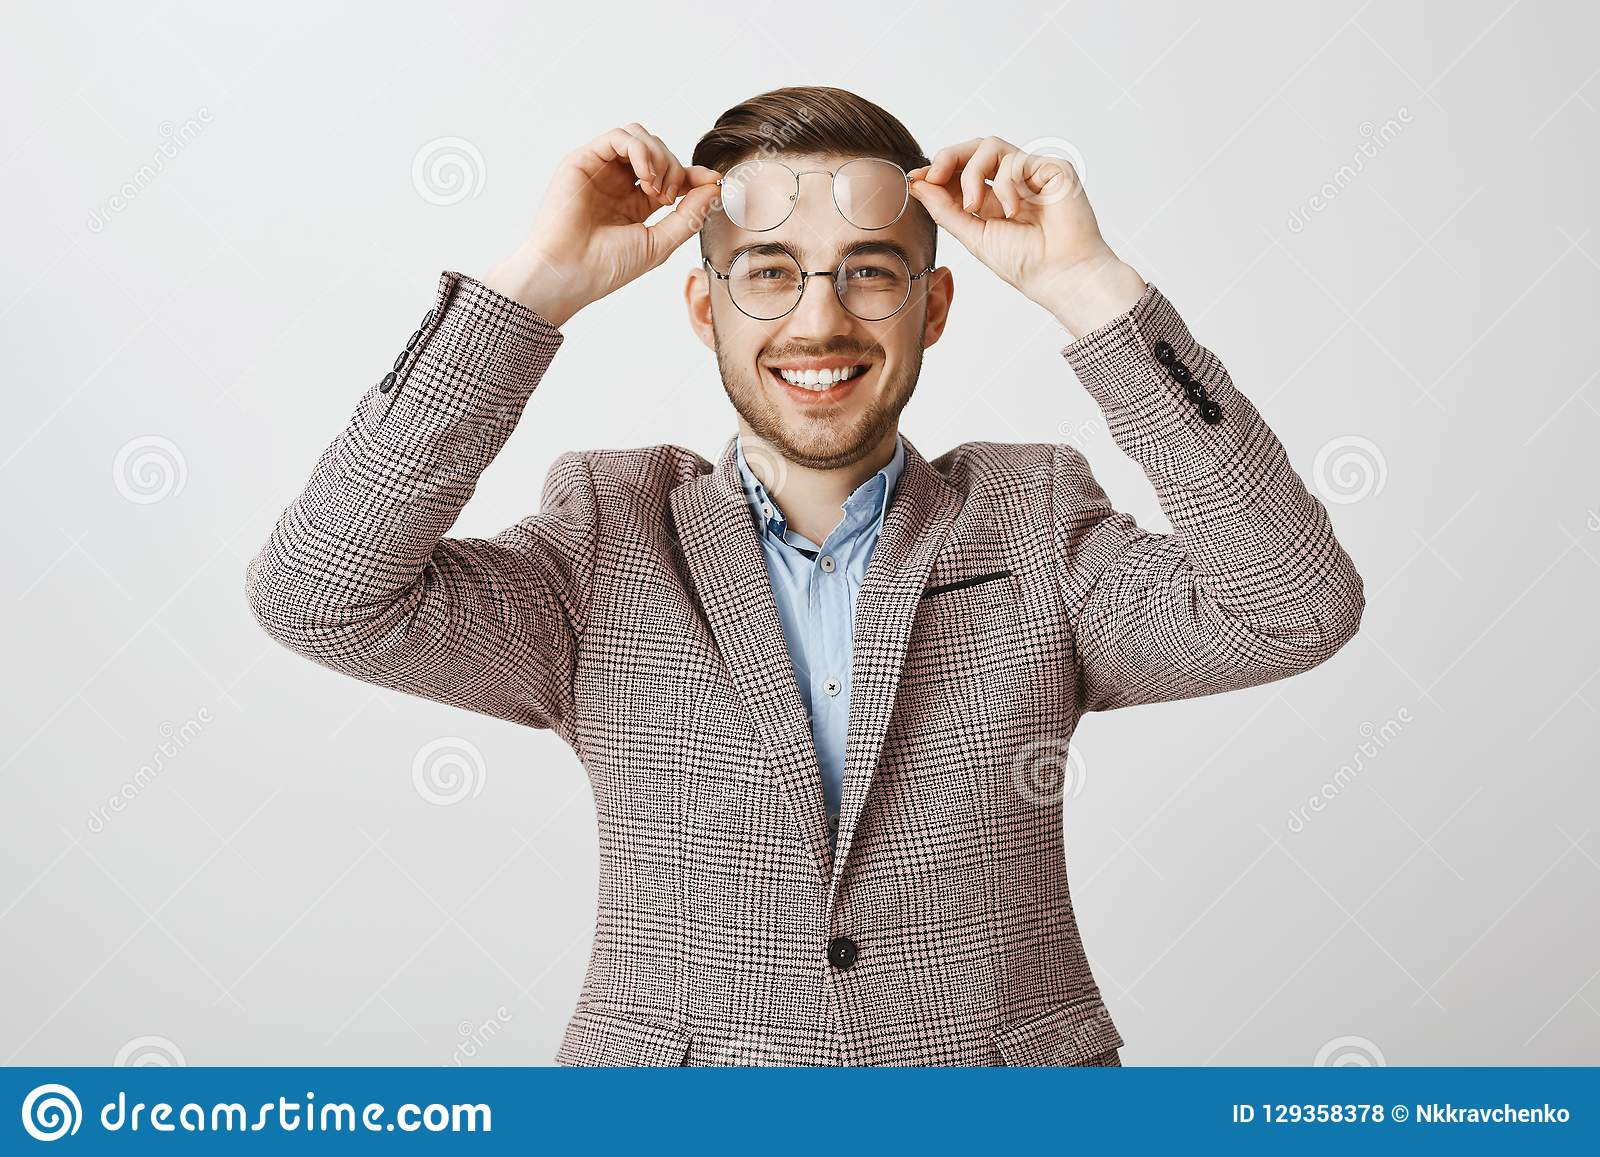 Corte de cabello pecho paloma